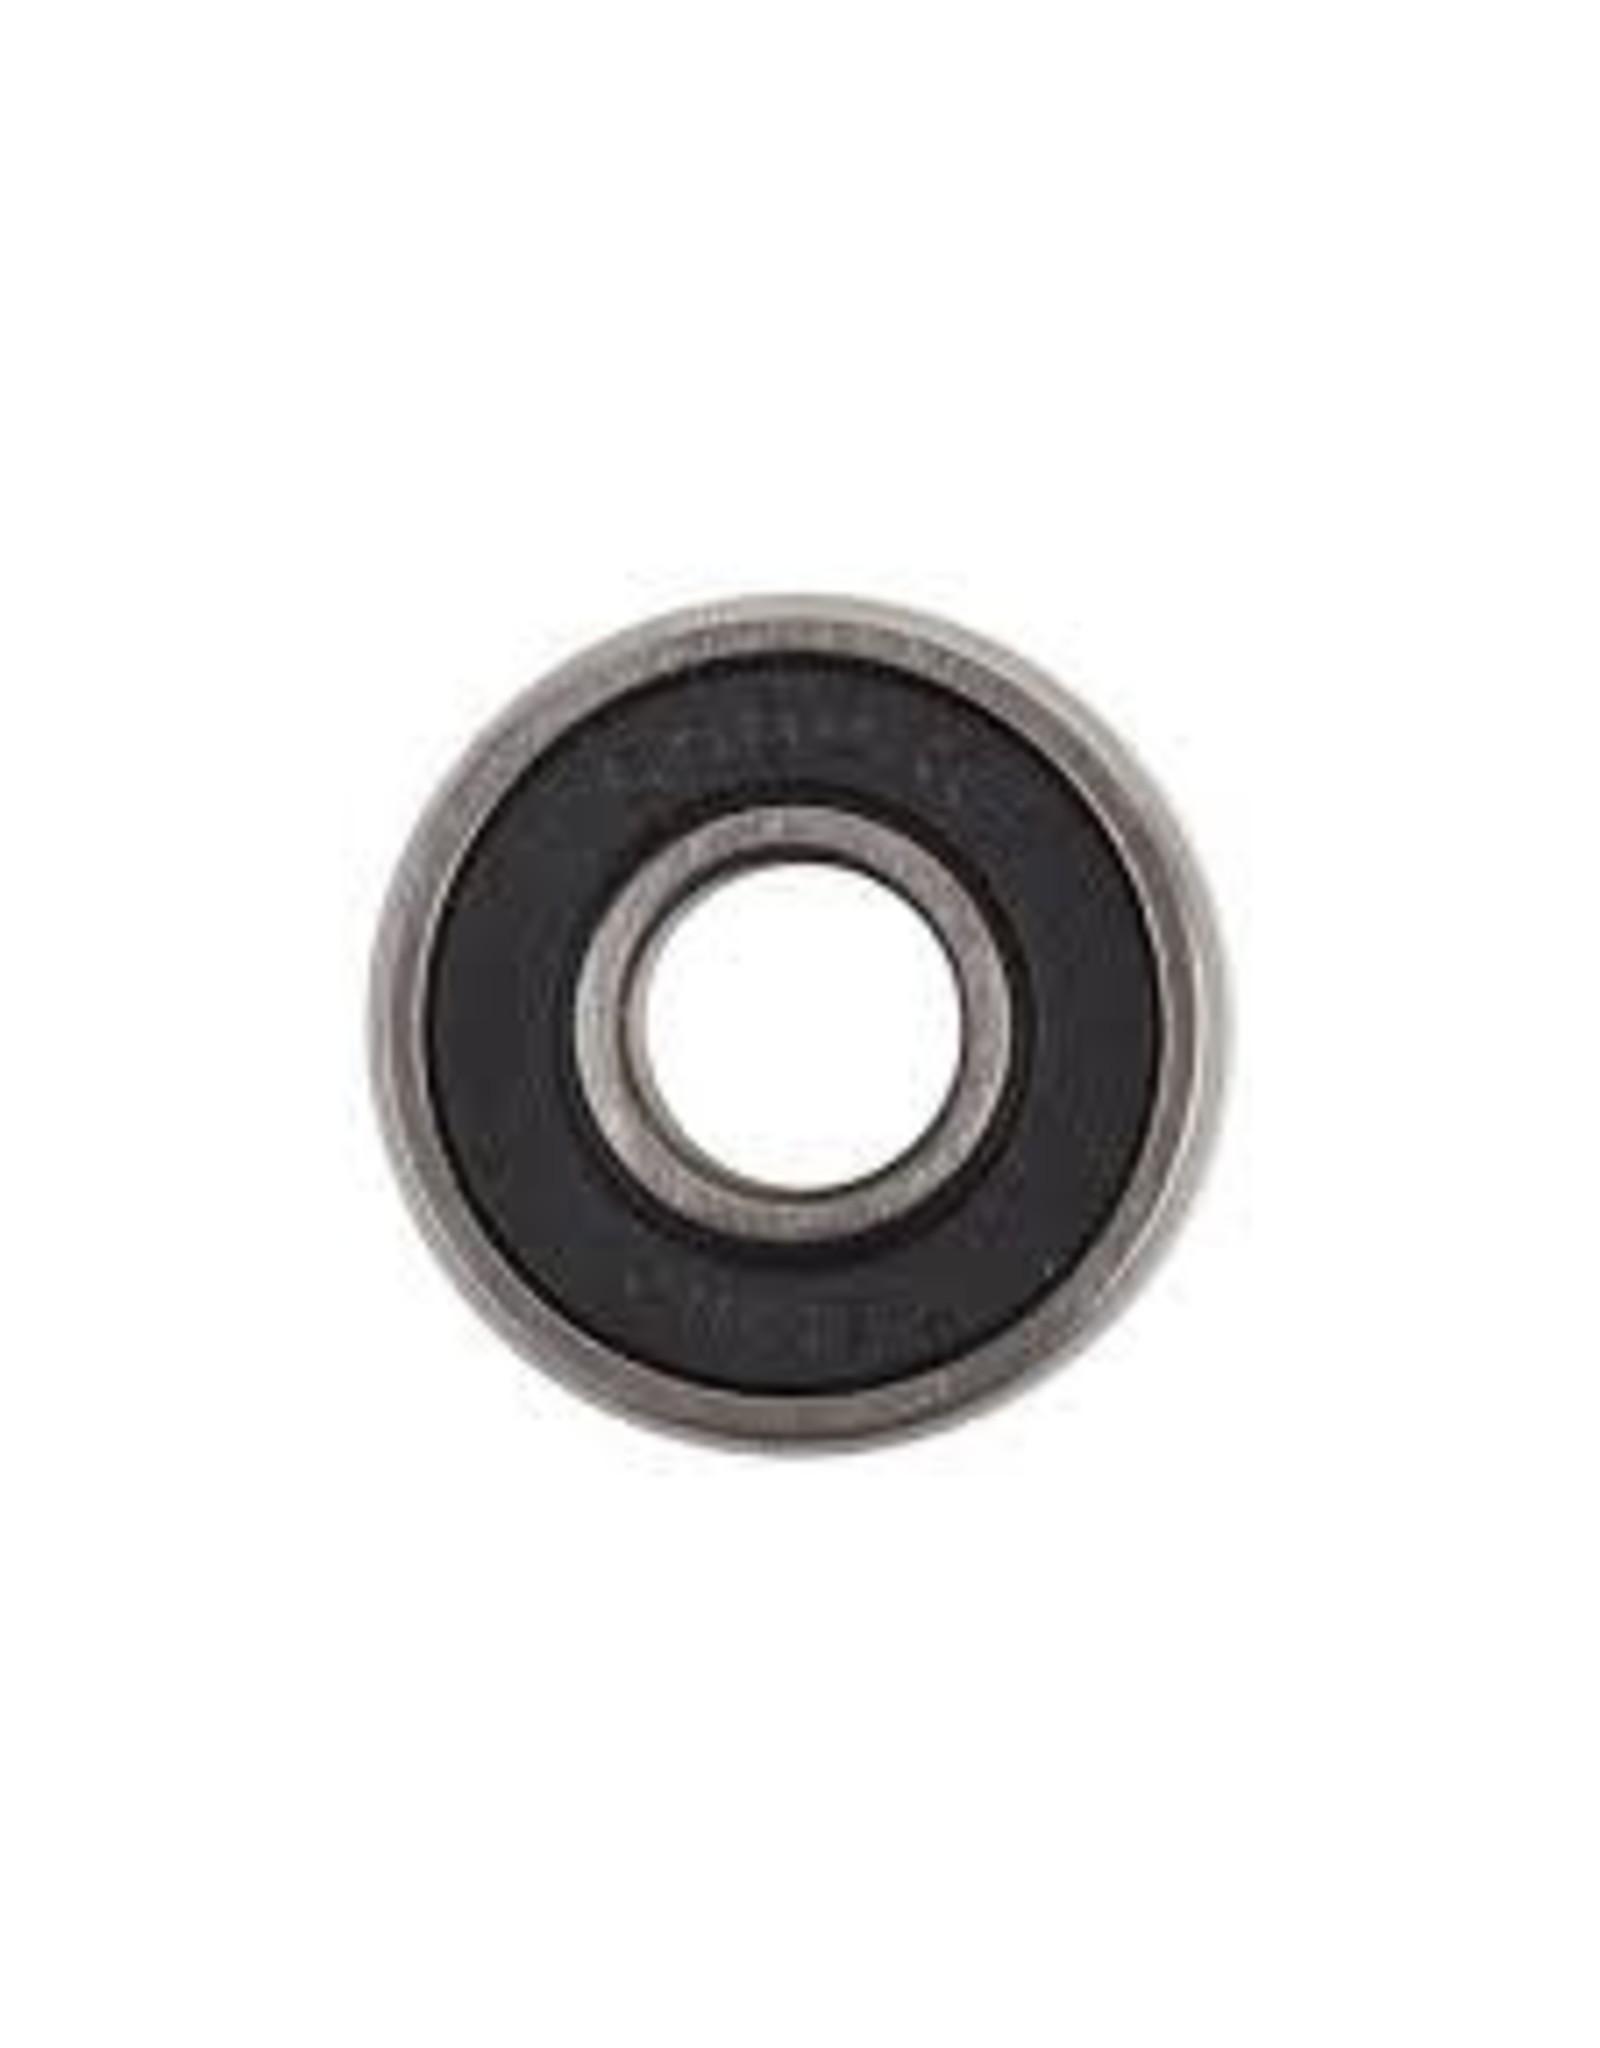 SUNLITE Bearing 6000-2RS Cartridge 10iX26oX8w Bag of 2